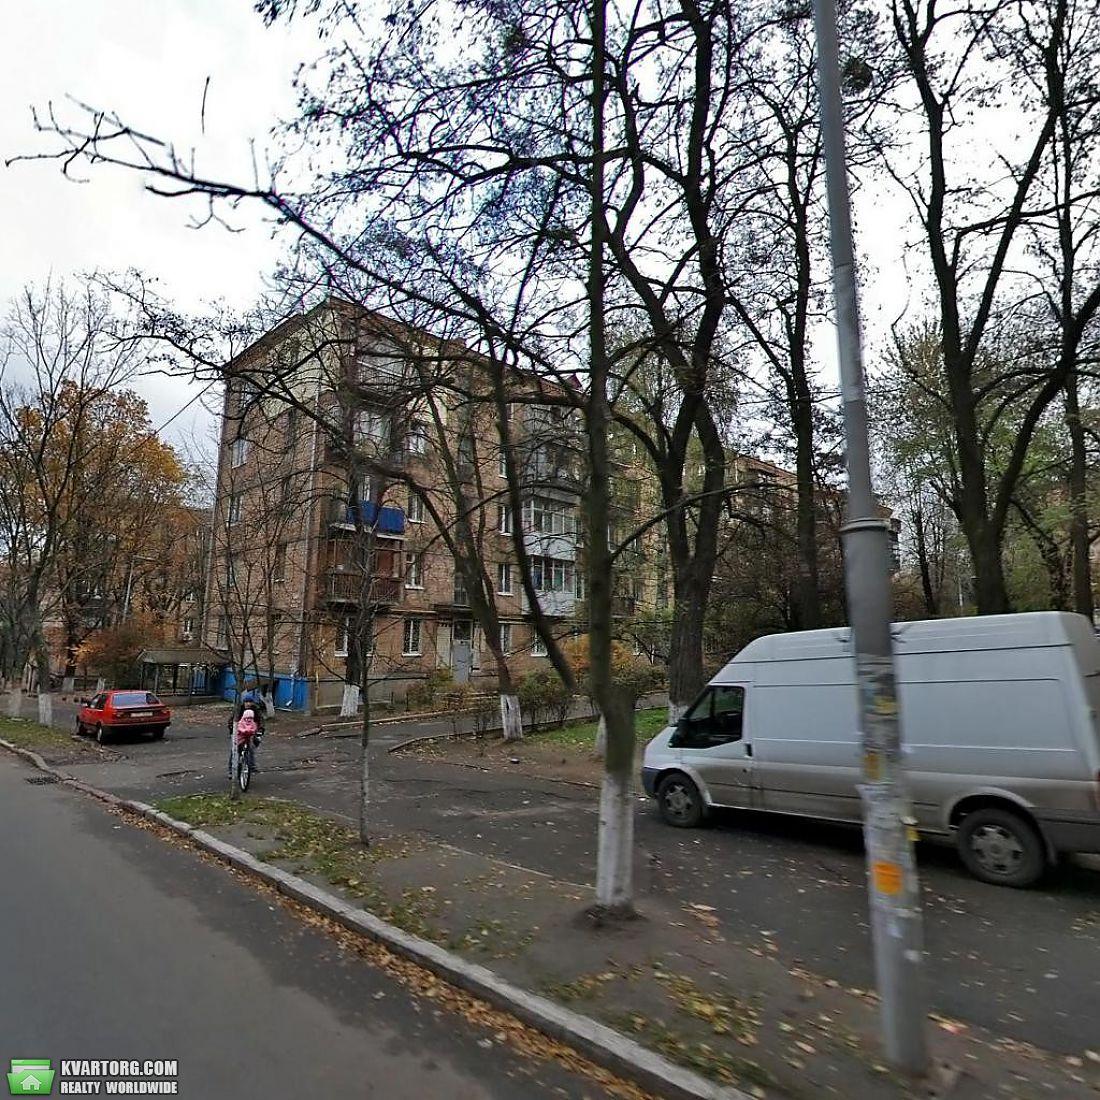 продам 1-комнатную квартиру. Киев, ул. Уманская 25. Цена: 29000$  (ID 1793930) - Фото 1